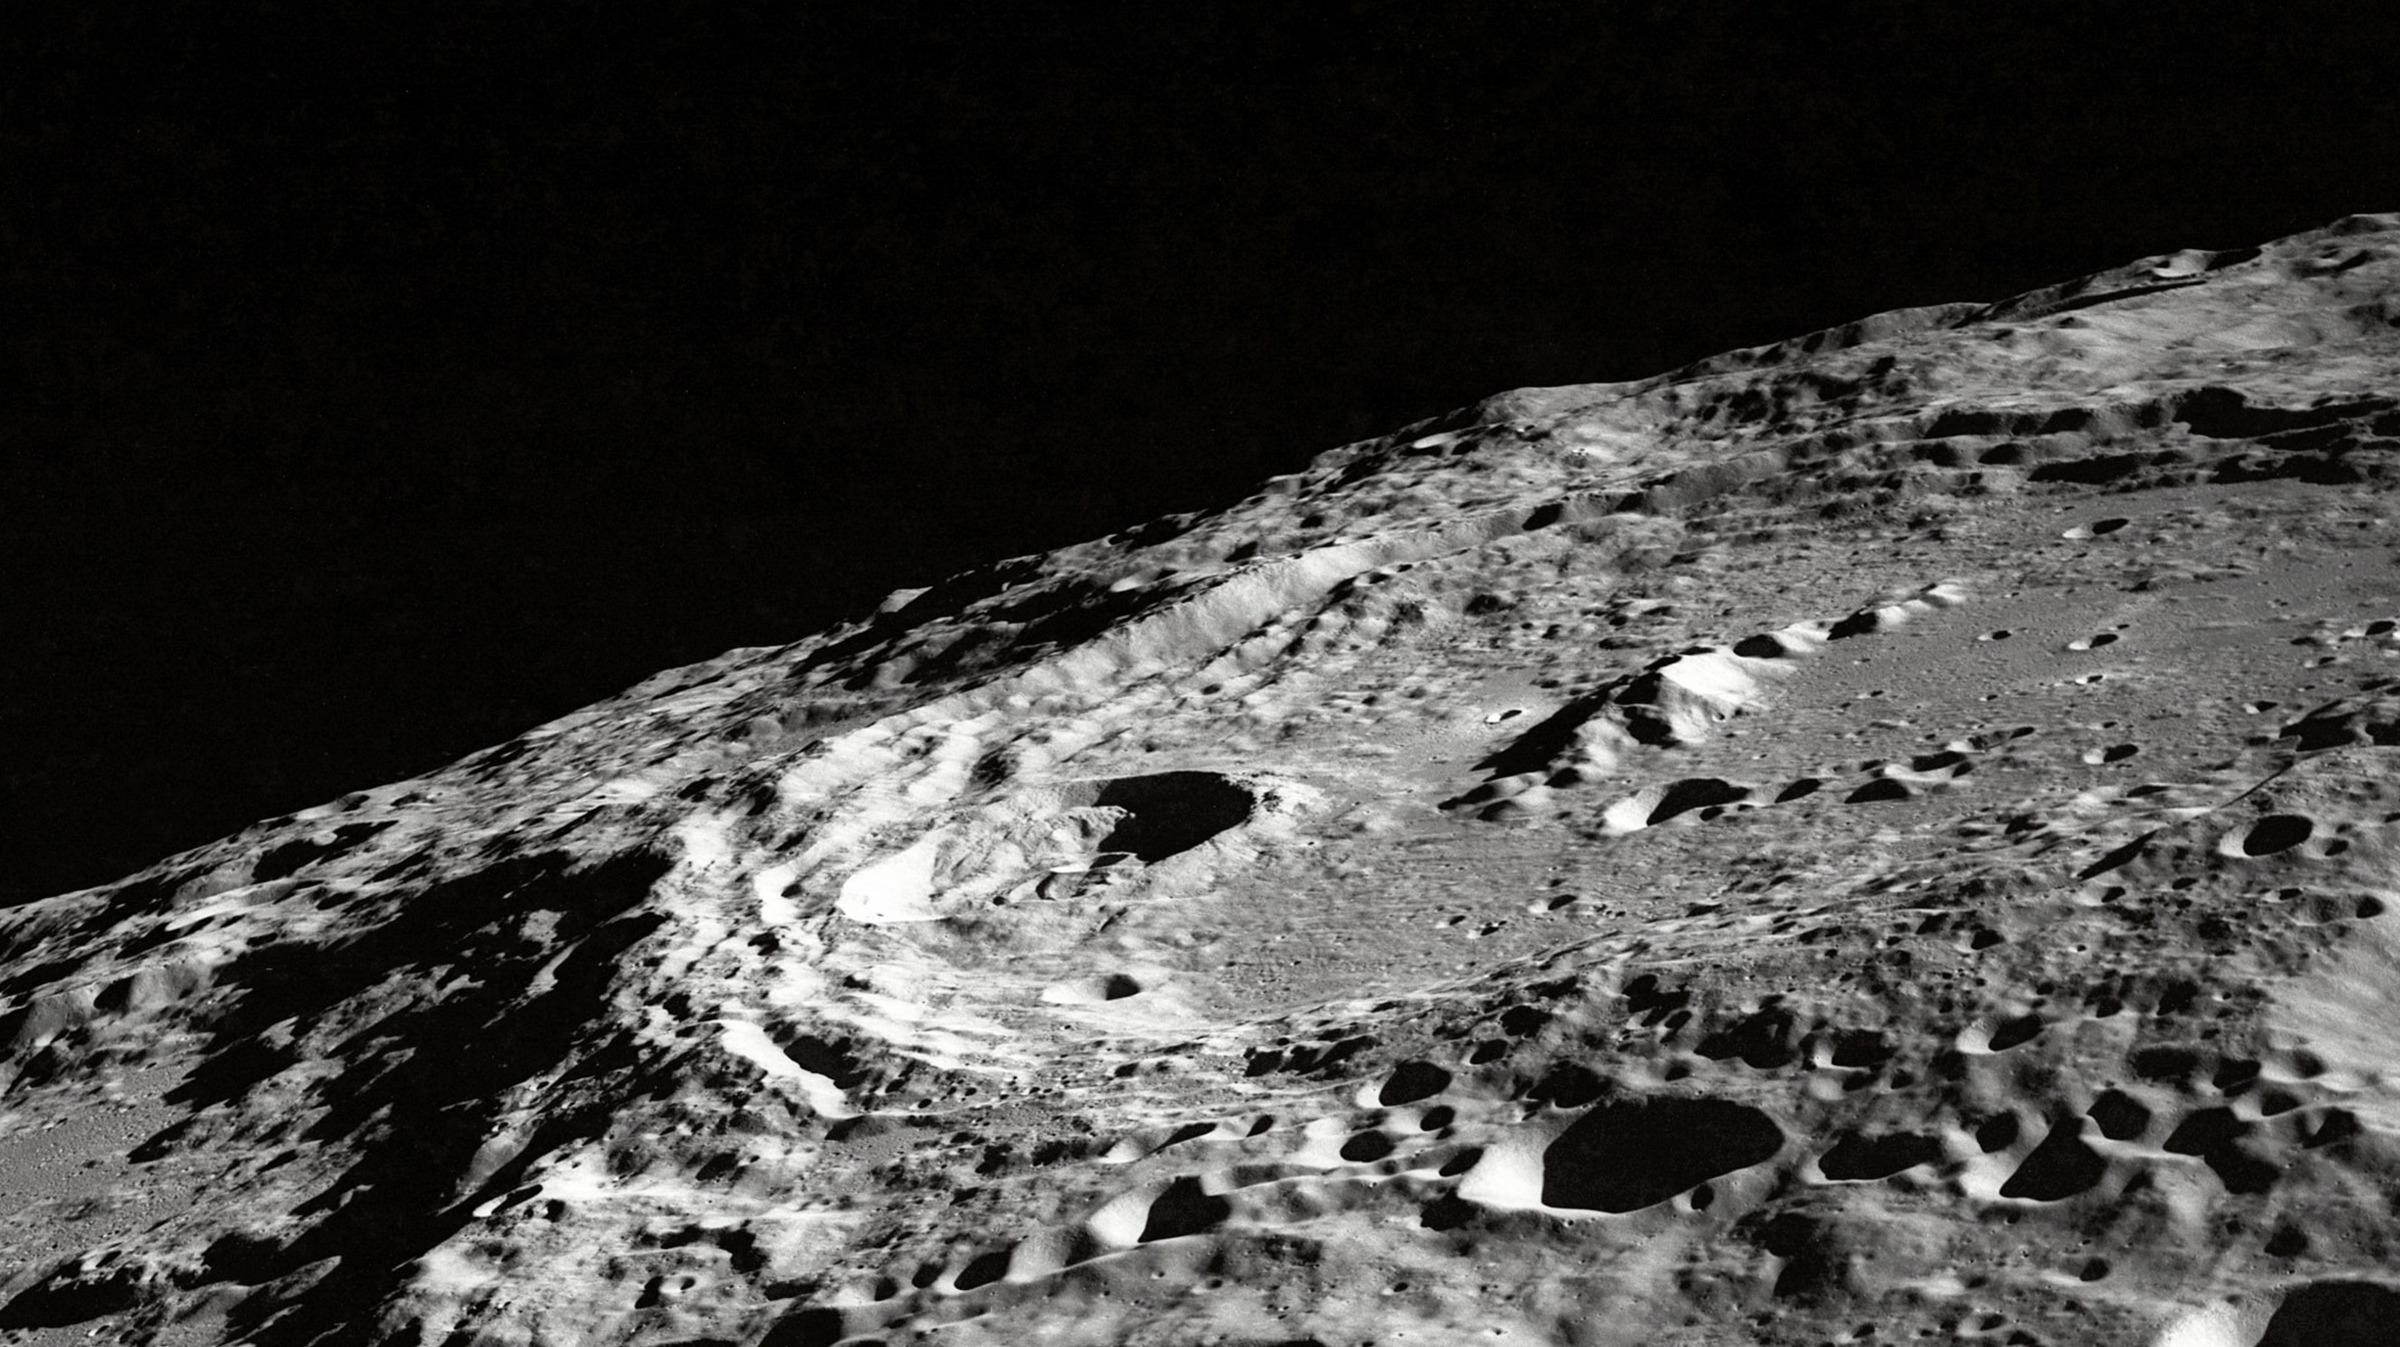 Moonscape image by NASA on Unsplash